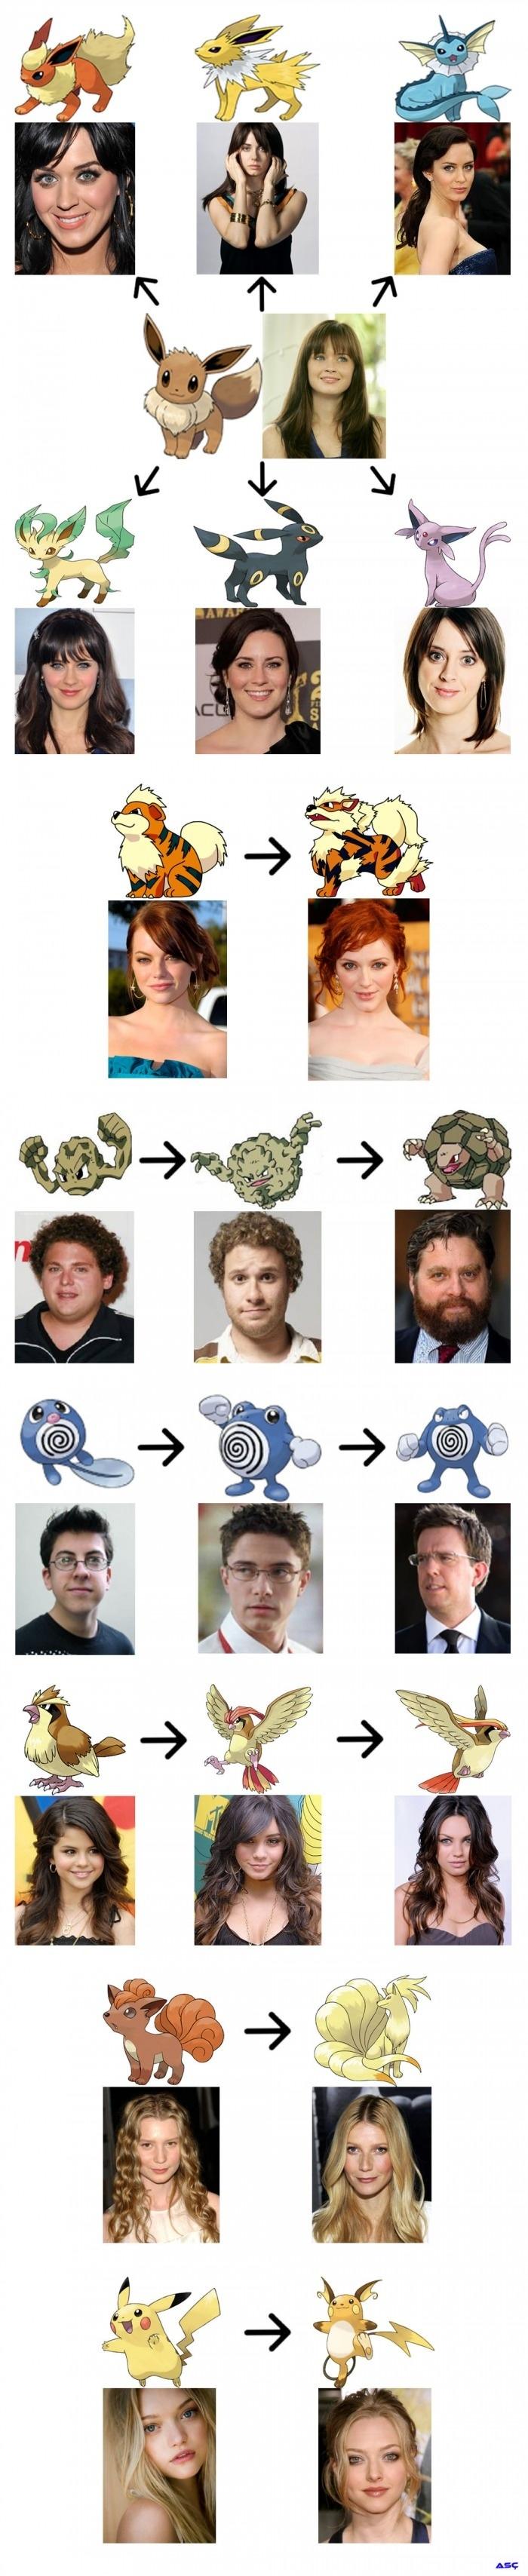 Pokemons & Celebrities